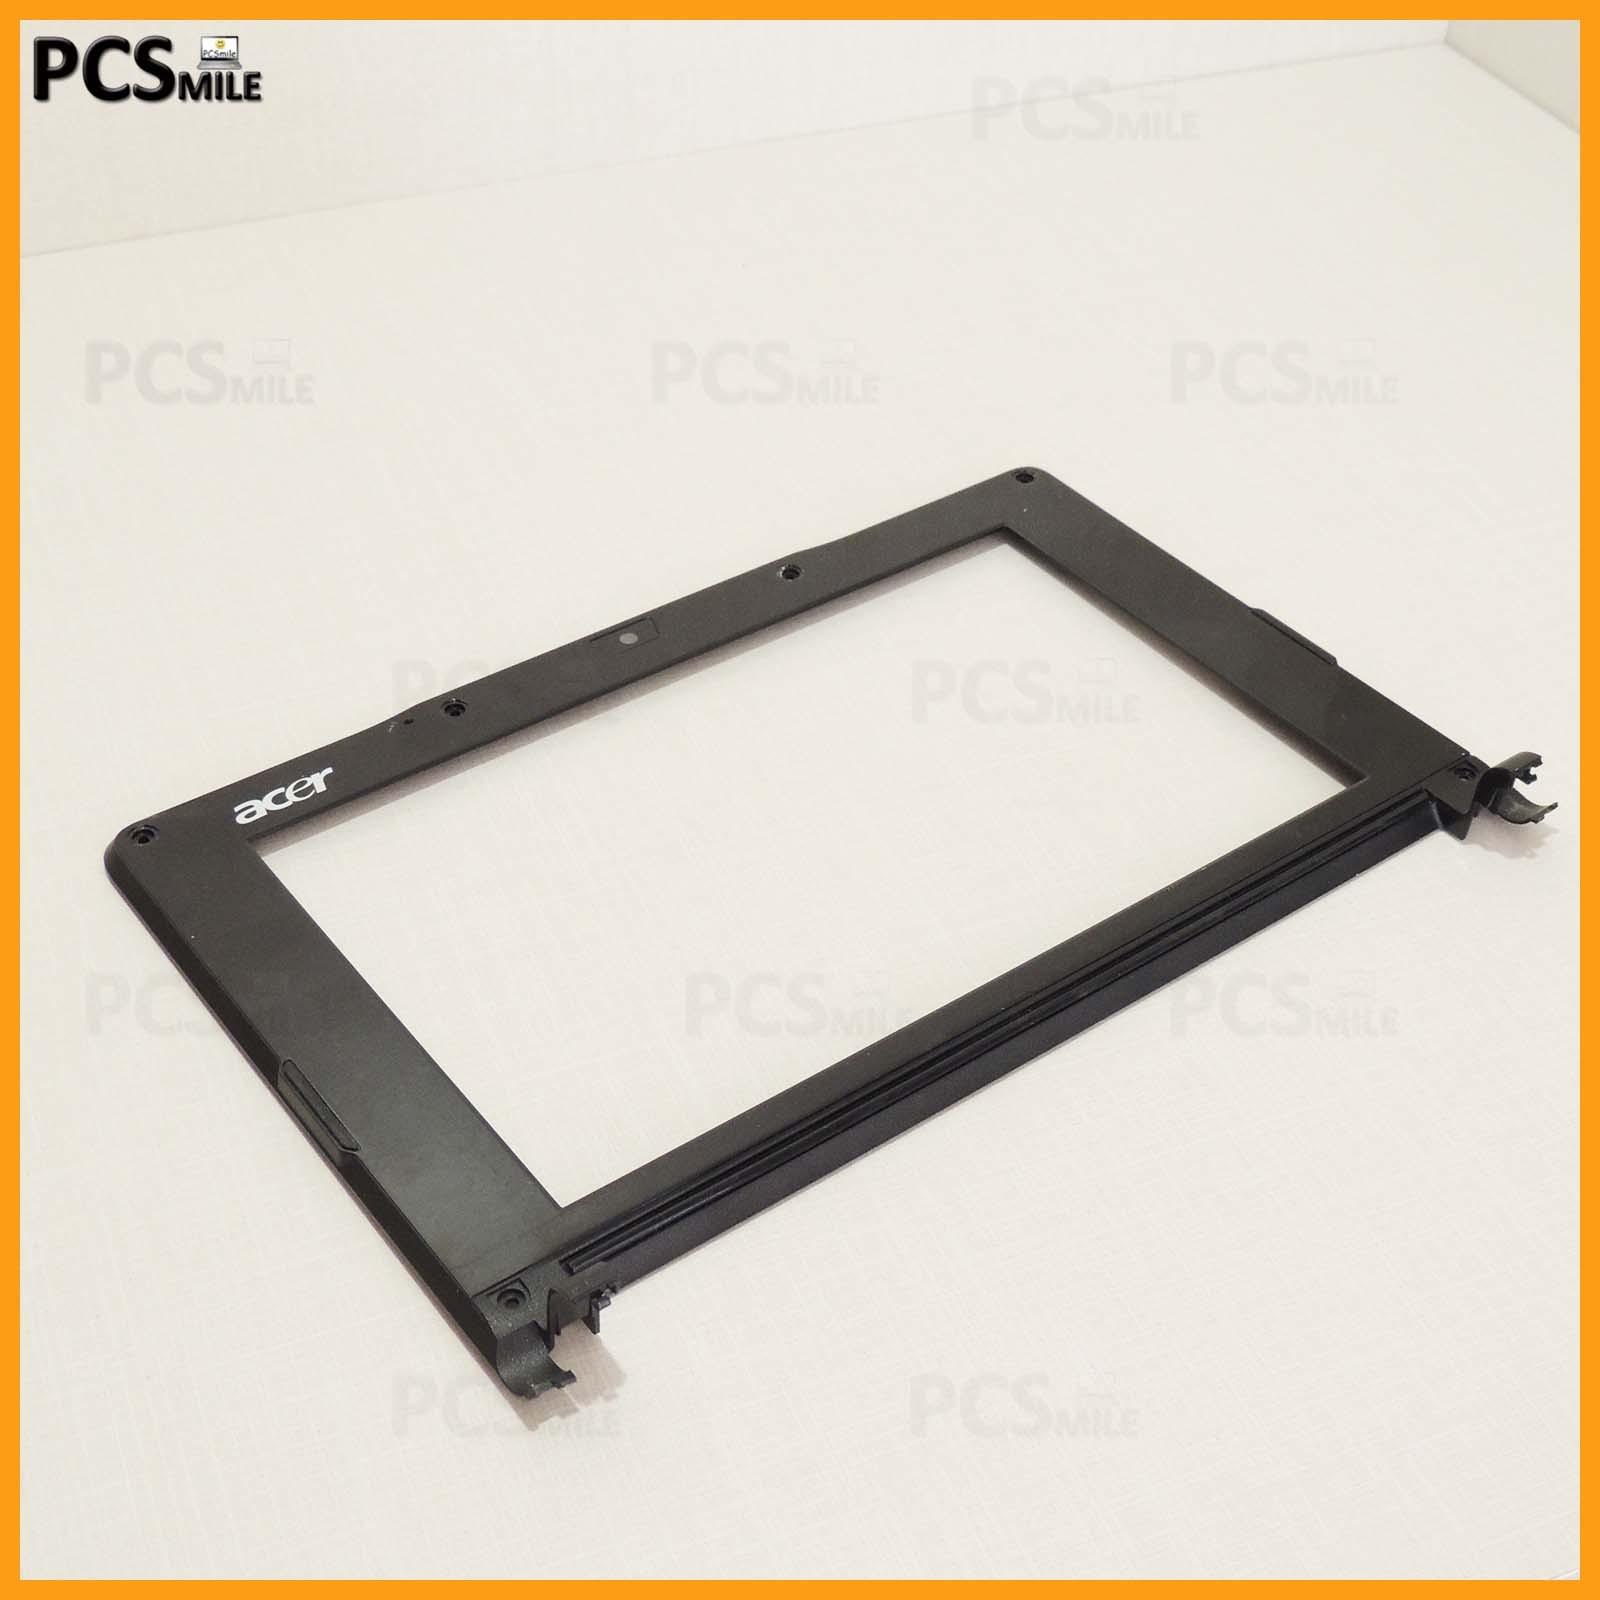 Cornice schermo Acer Aspire One ZG5 Scocca FOX3BZG5LCTN10080912-14